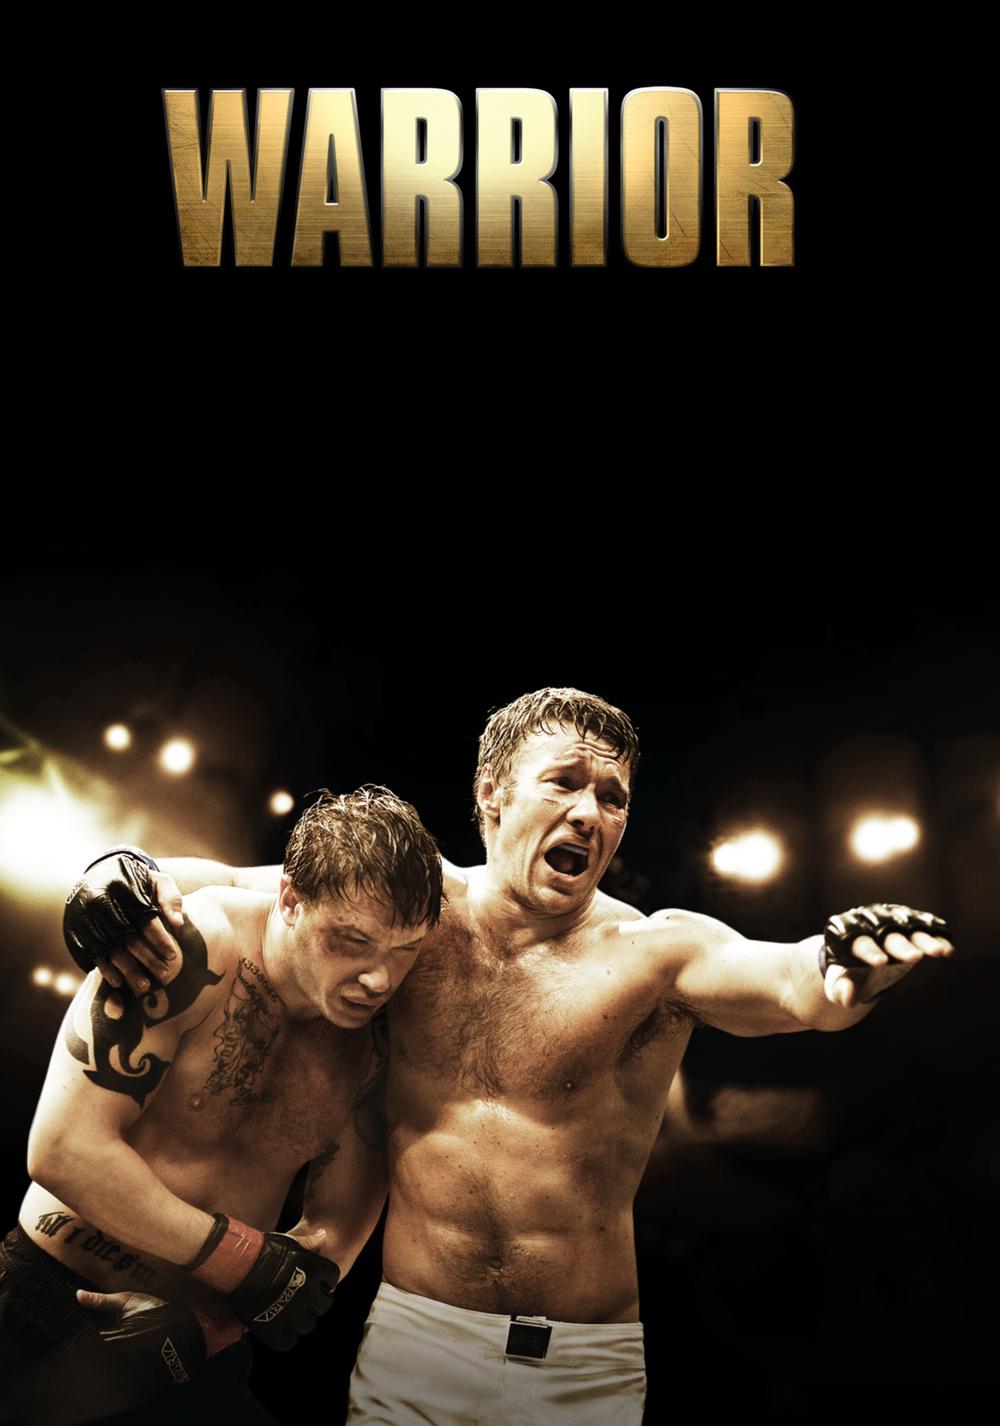 warrior movie poster wwwimgkidcom the image kid has it